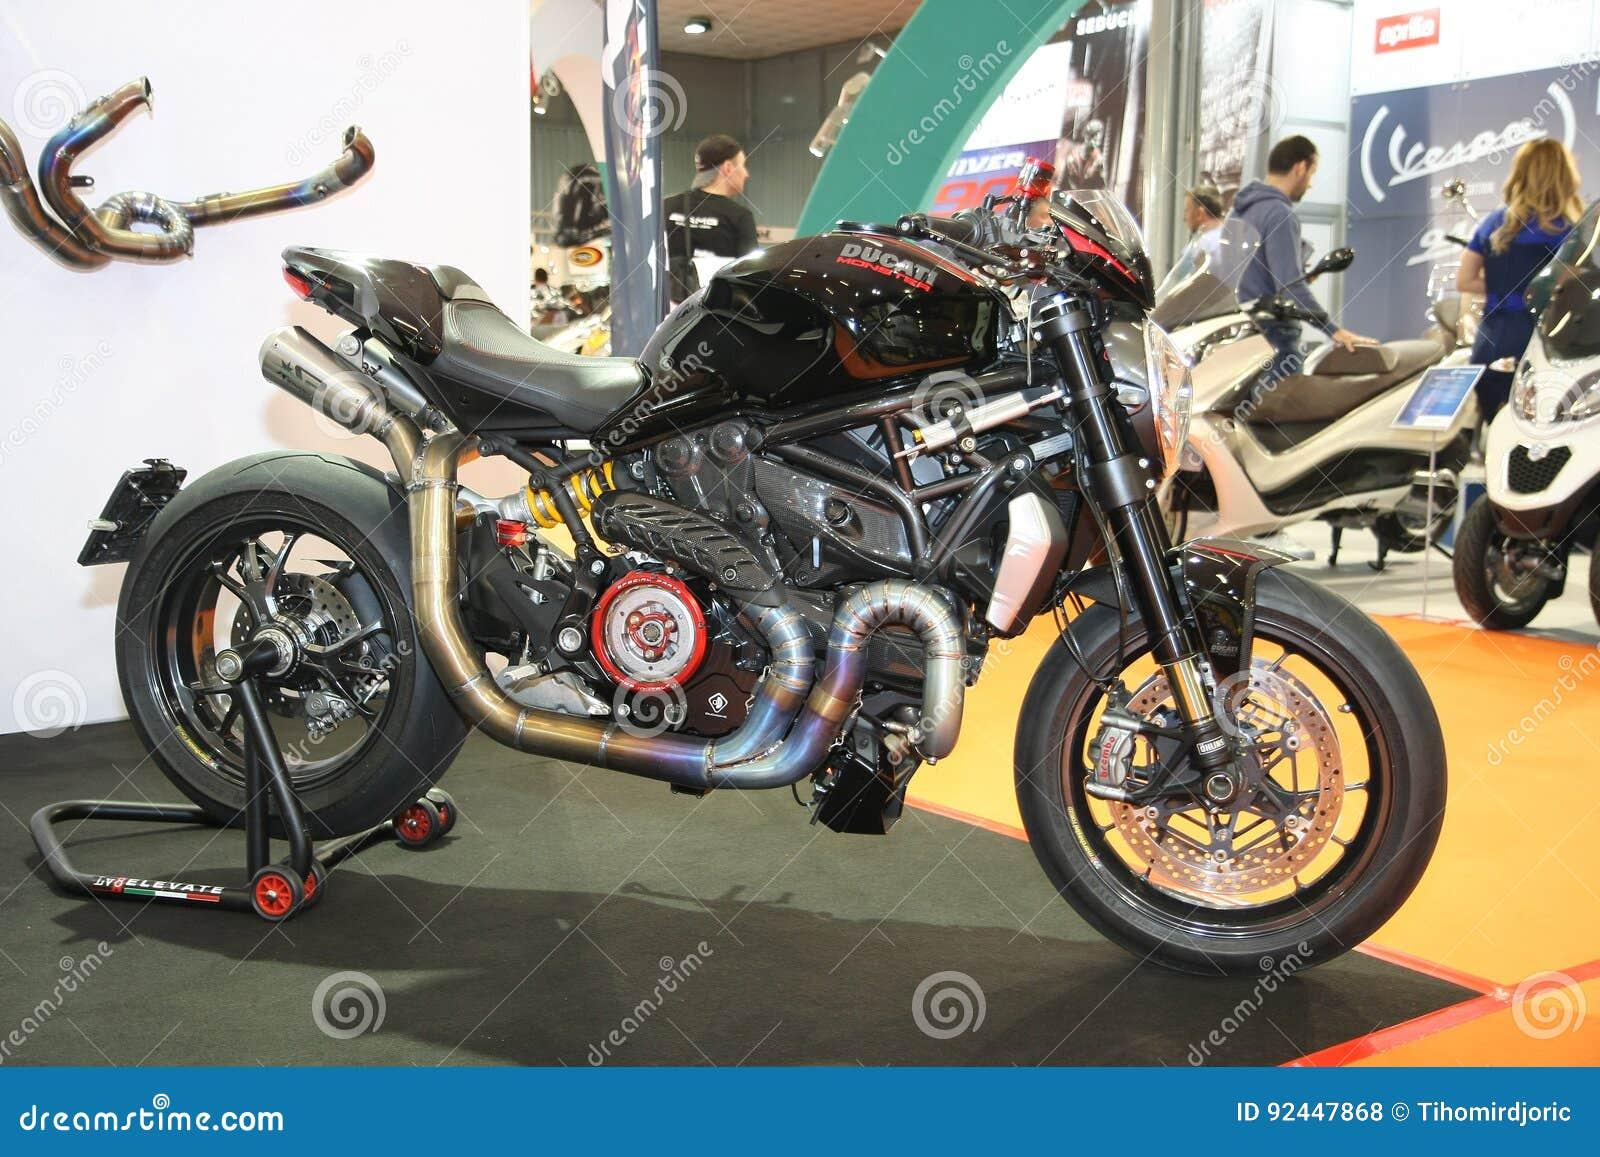 Ducati At Belgrade Car Show Editorial Stock Photo Image Of